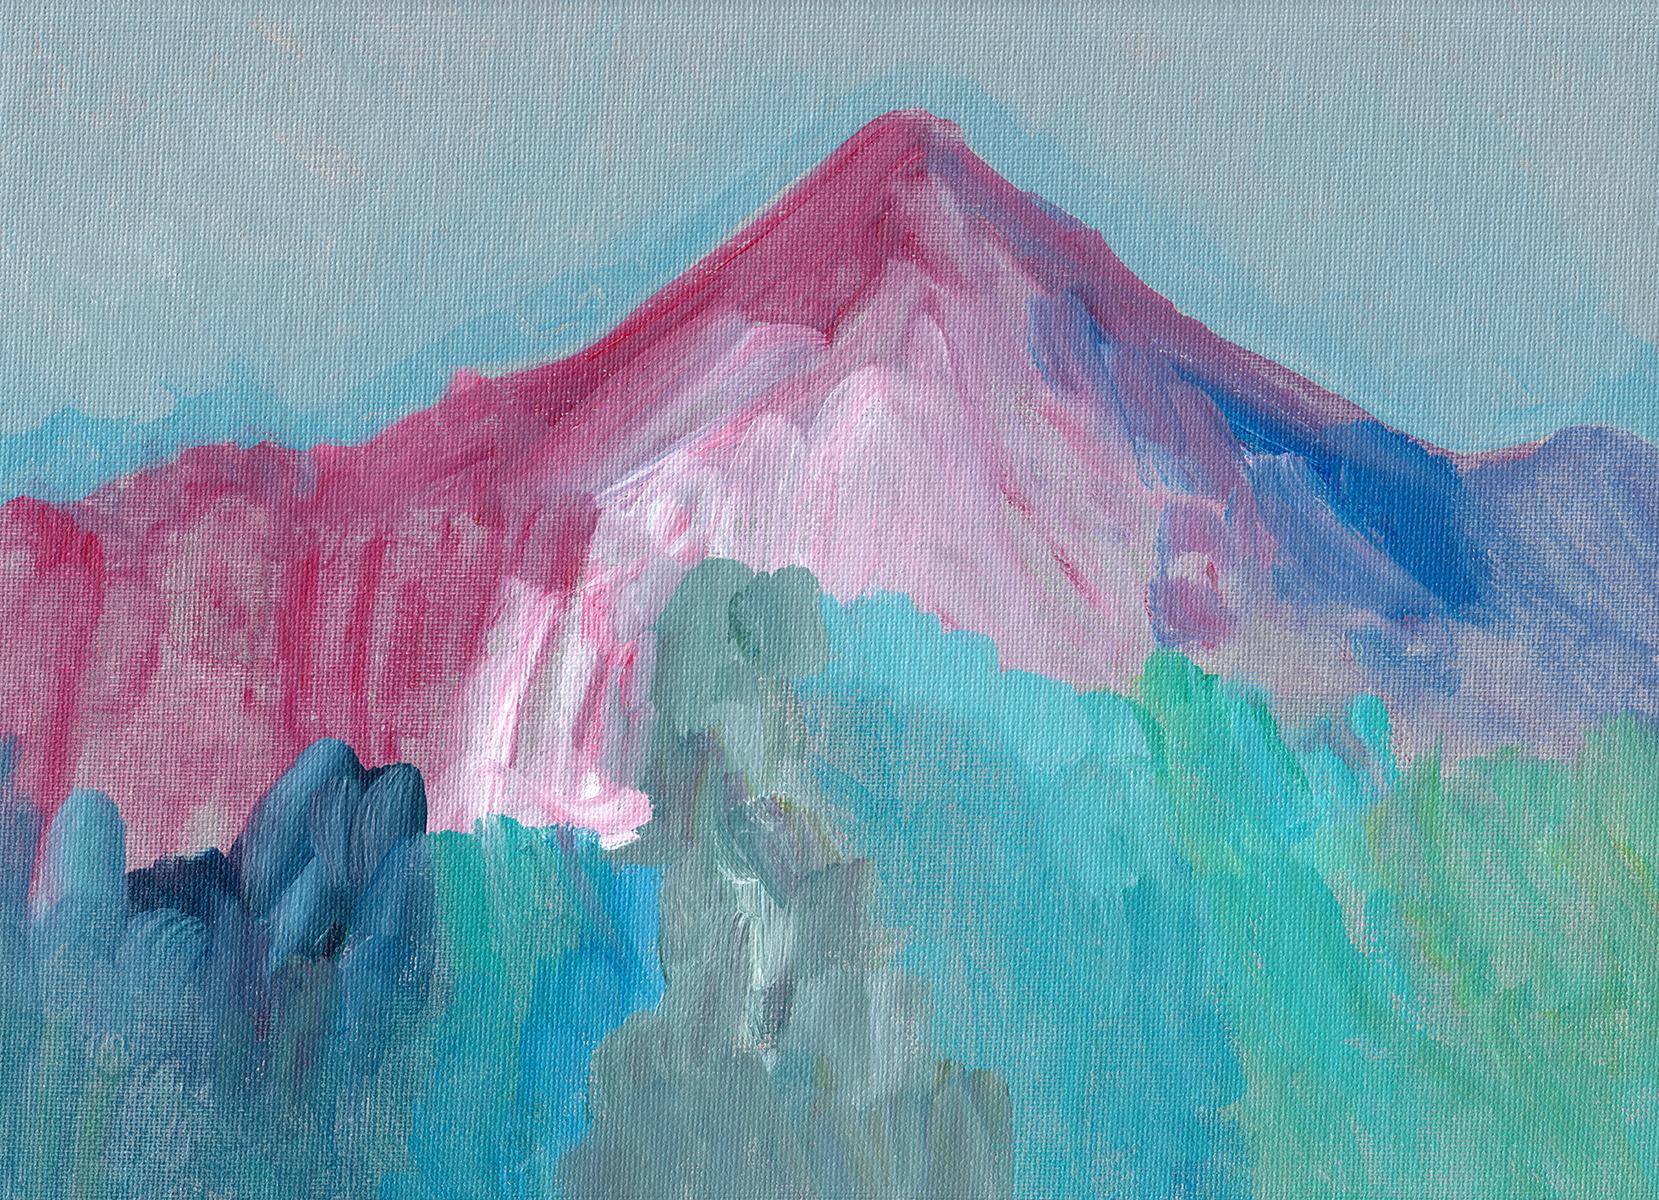 bali-painting-11-1200.jpg